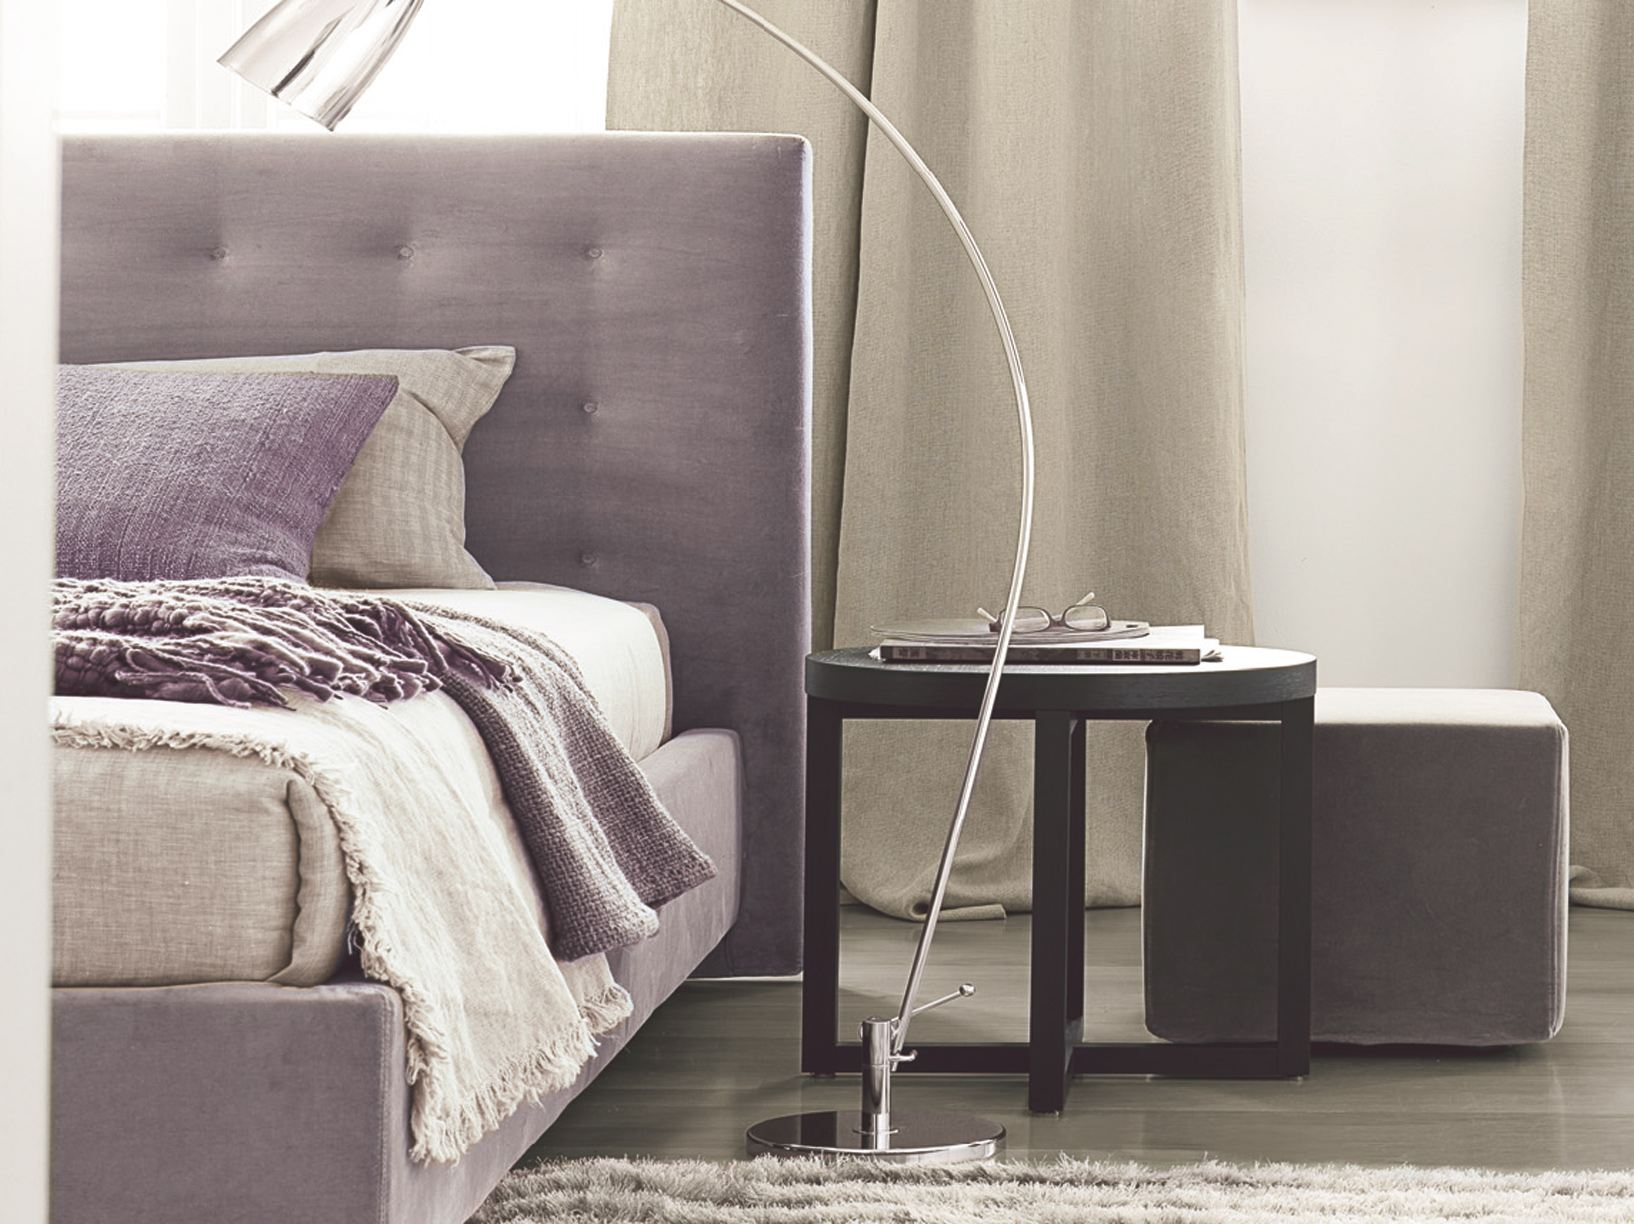 Home products chairs ics ipsilon - Home Products Chairs Ics Ipsilon 49